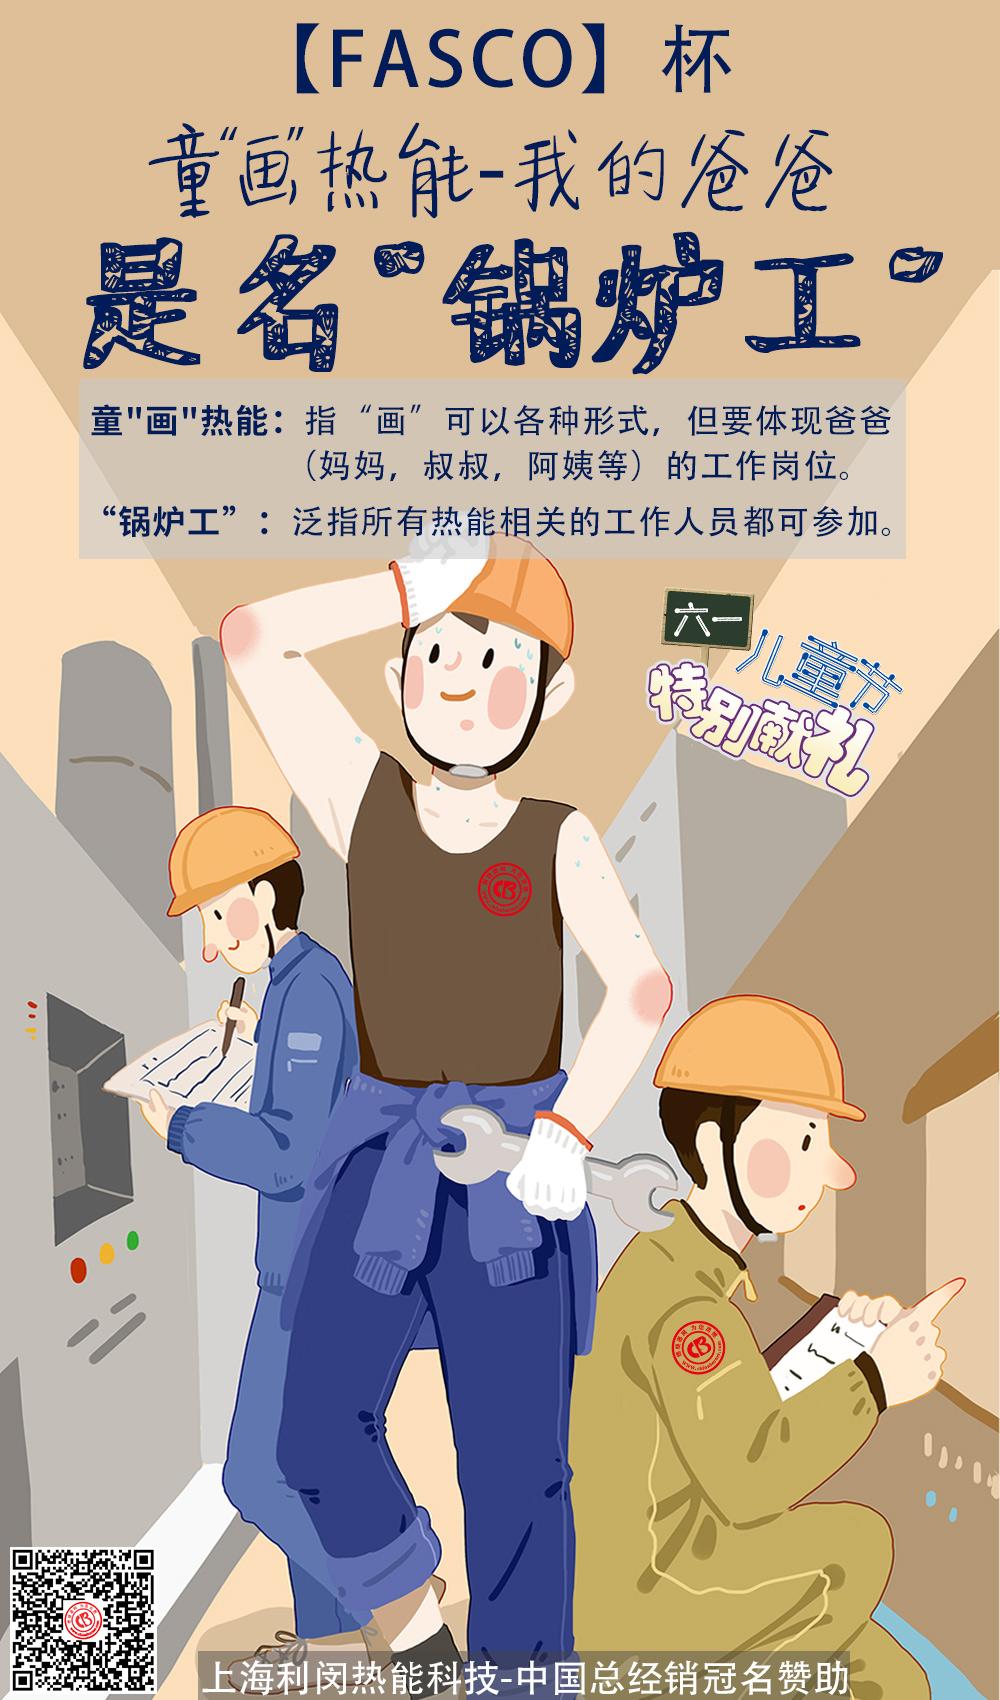 "【FASCO】杯《童画热能 -我的爸爸是名""锅炉工""》六一儿童节活动"